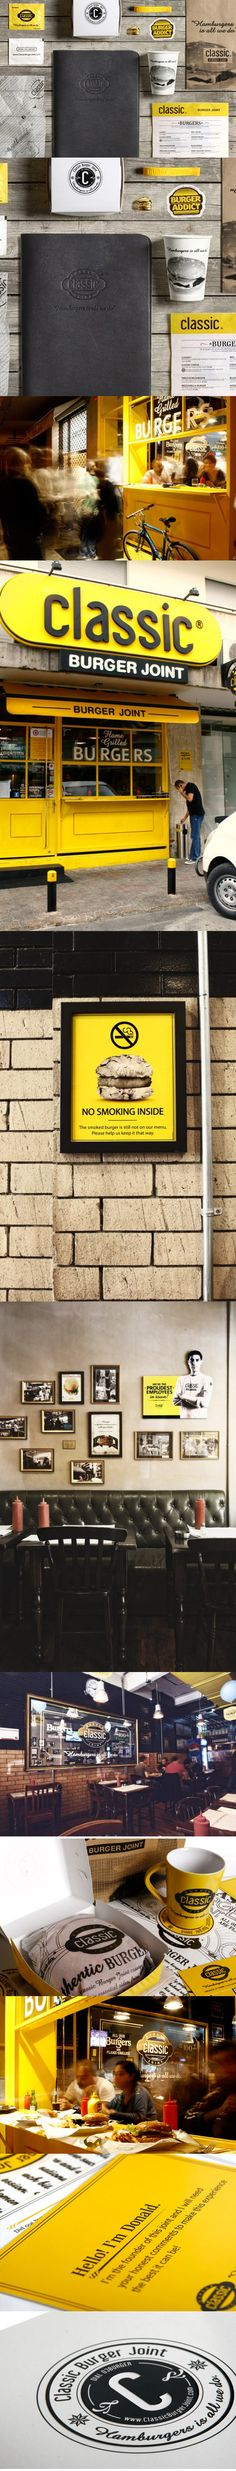 Classic Burger brand   Designer: Wonder Eight   #stationary #corporate #design #corporatedesign #logo #identity #branding #marketing <<< repinned by an #advertising agency from #Hamburg / #Germany - www.BlickeDeeler.de   Follow us on www.facebook.com/BlickeDeeler